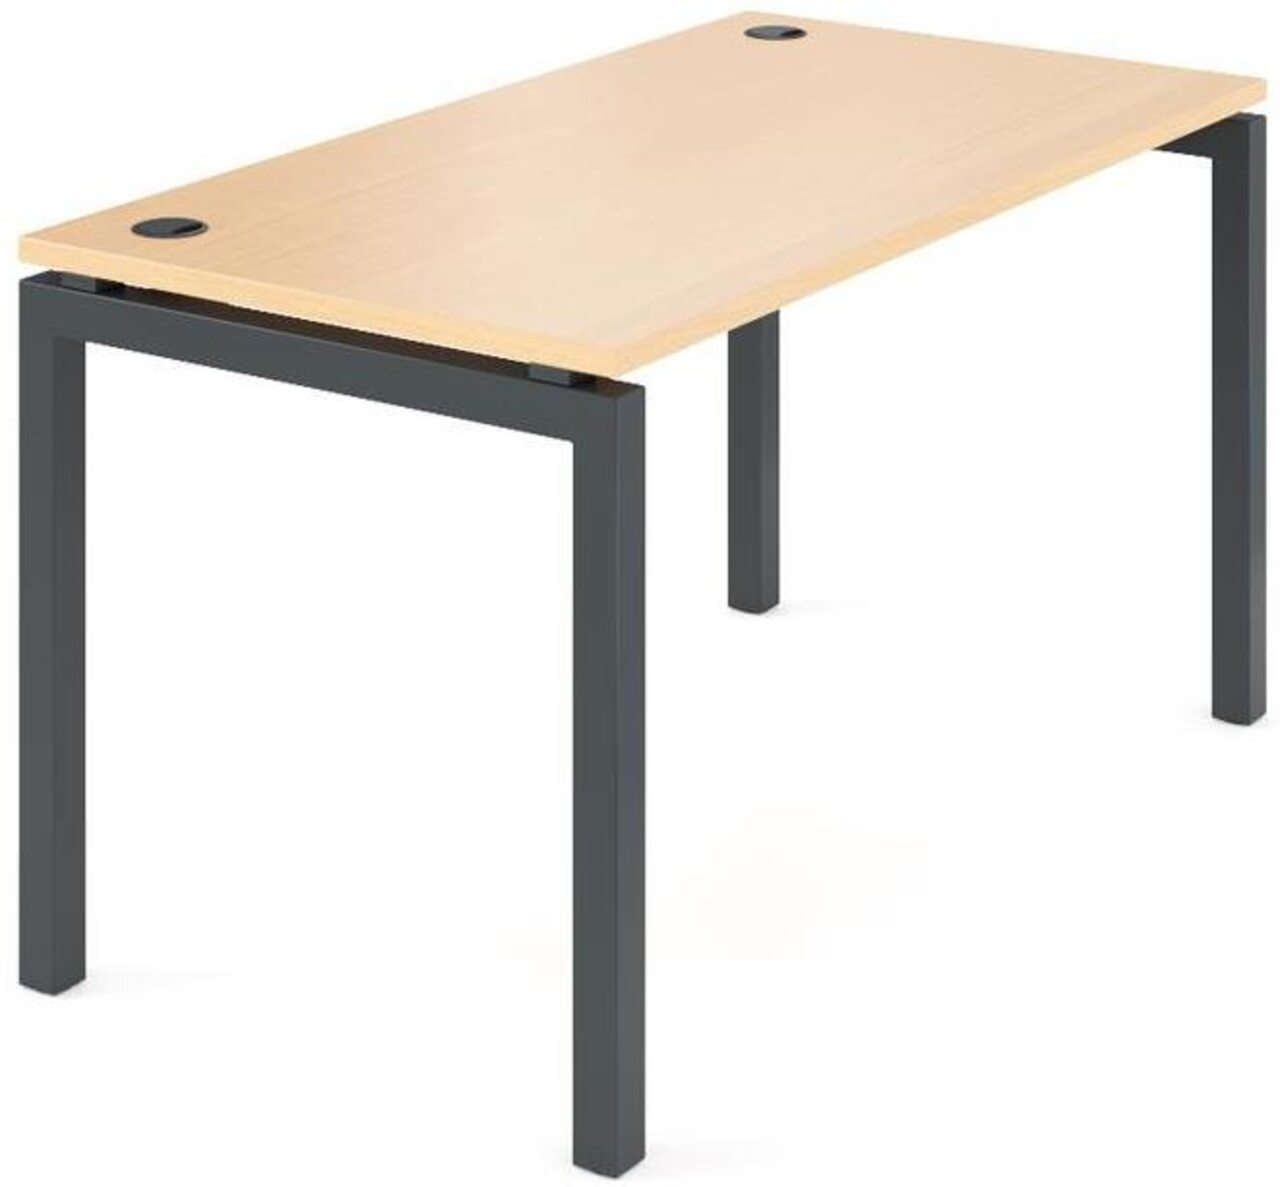 Стол на металлокаркасе  Арго 140x73x76 - фото 4